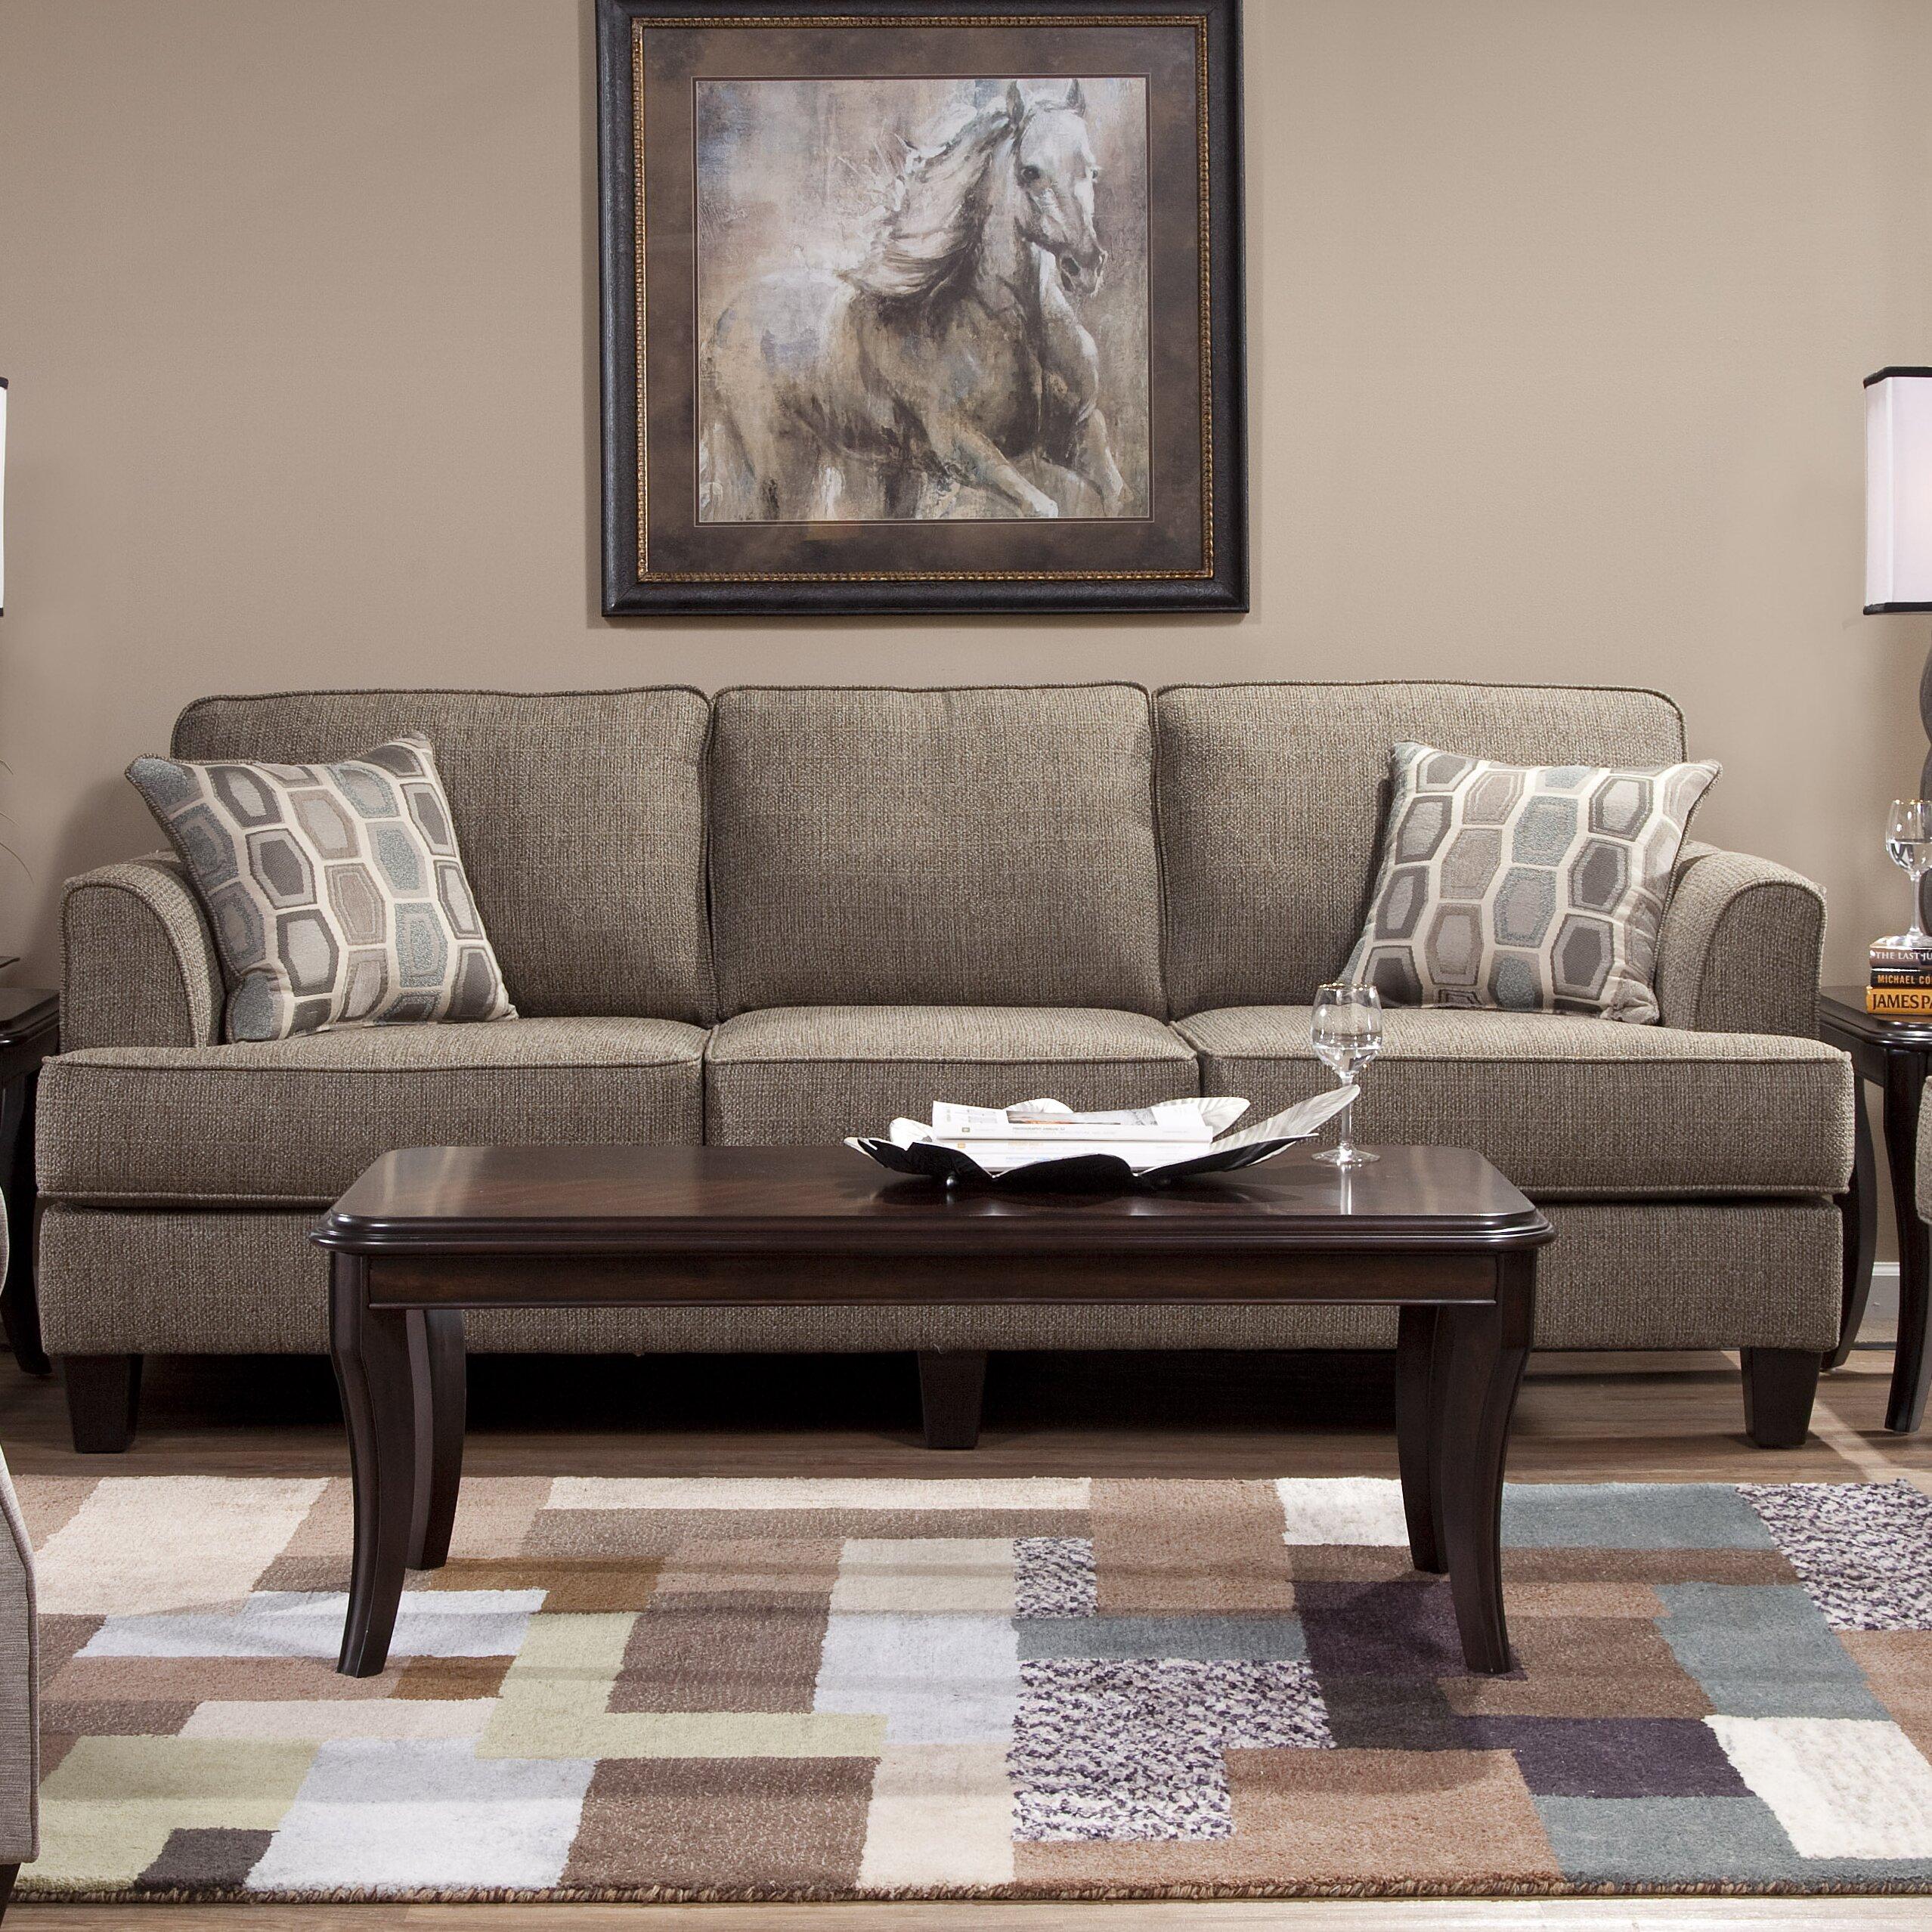 Red barrel studio serta upholstery dallas sofa